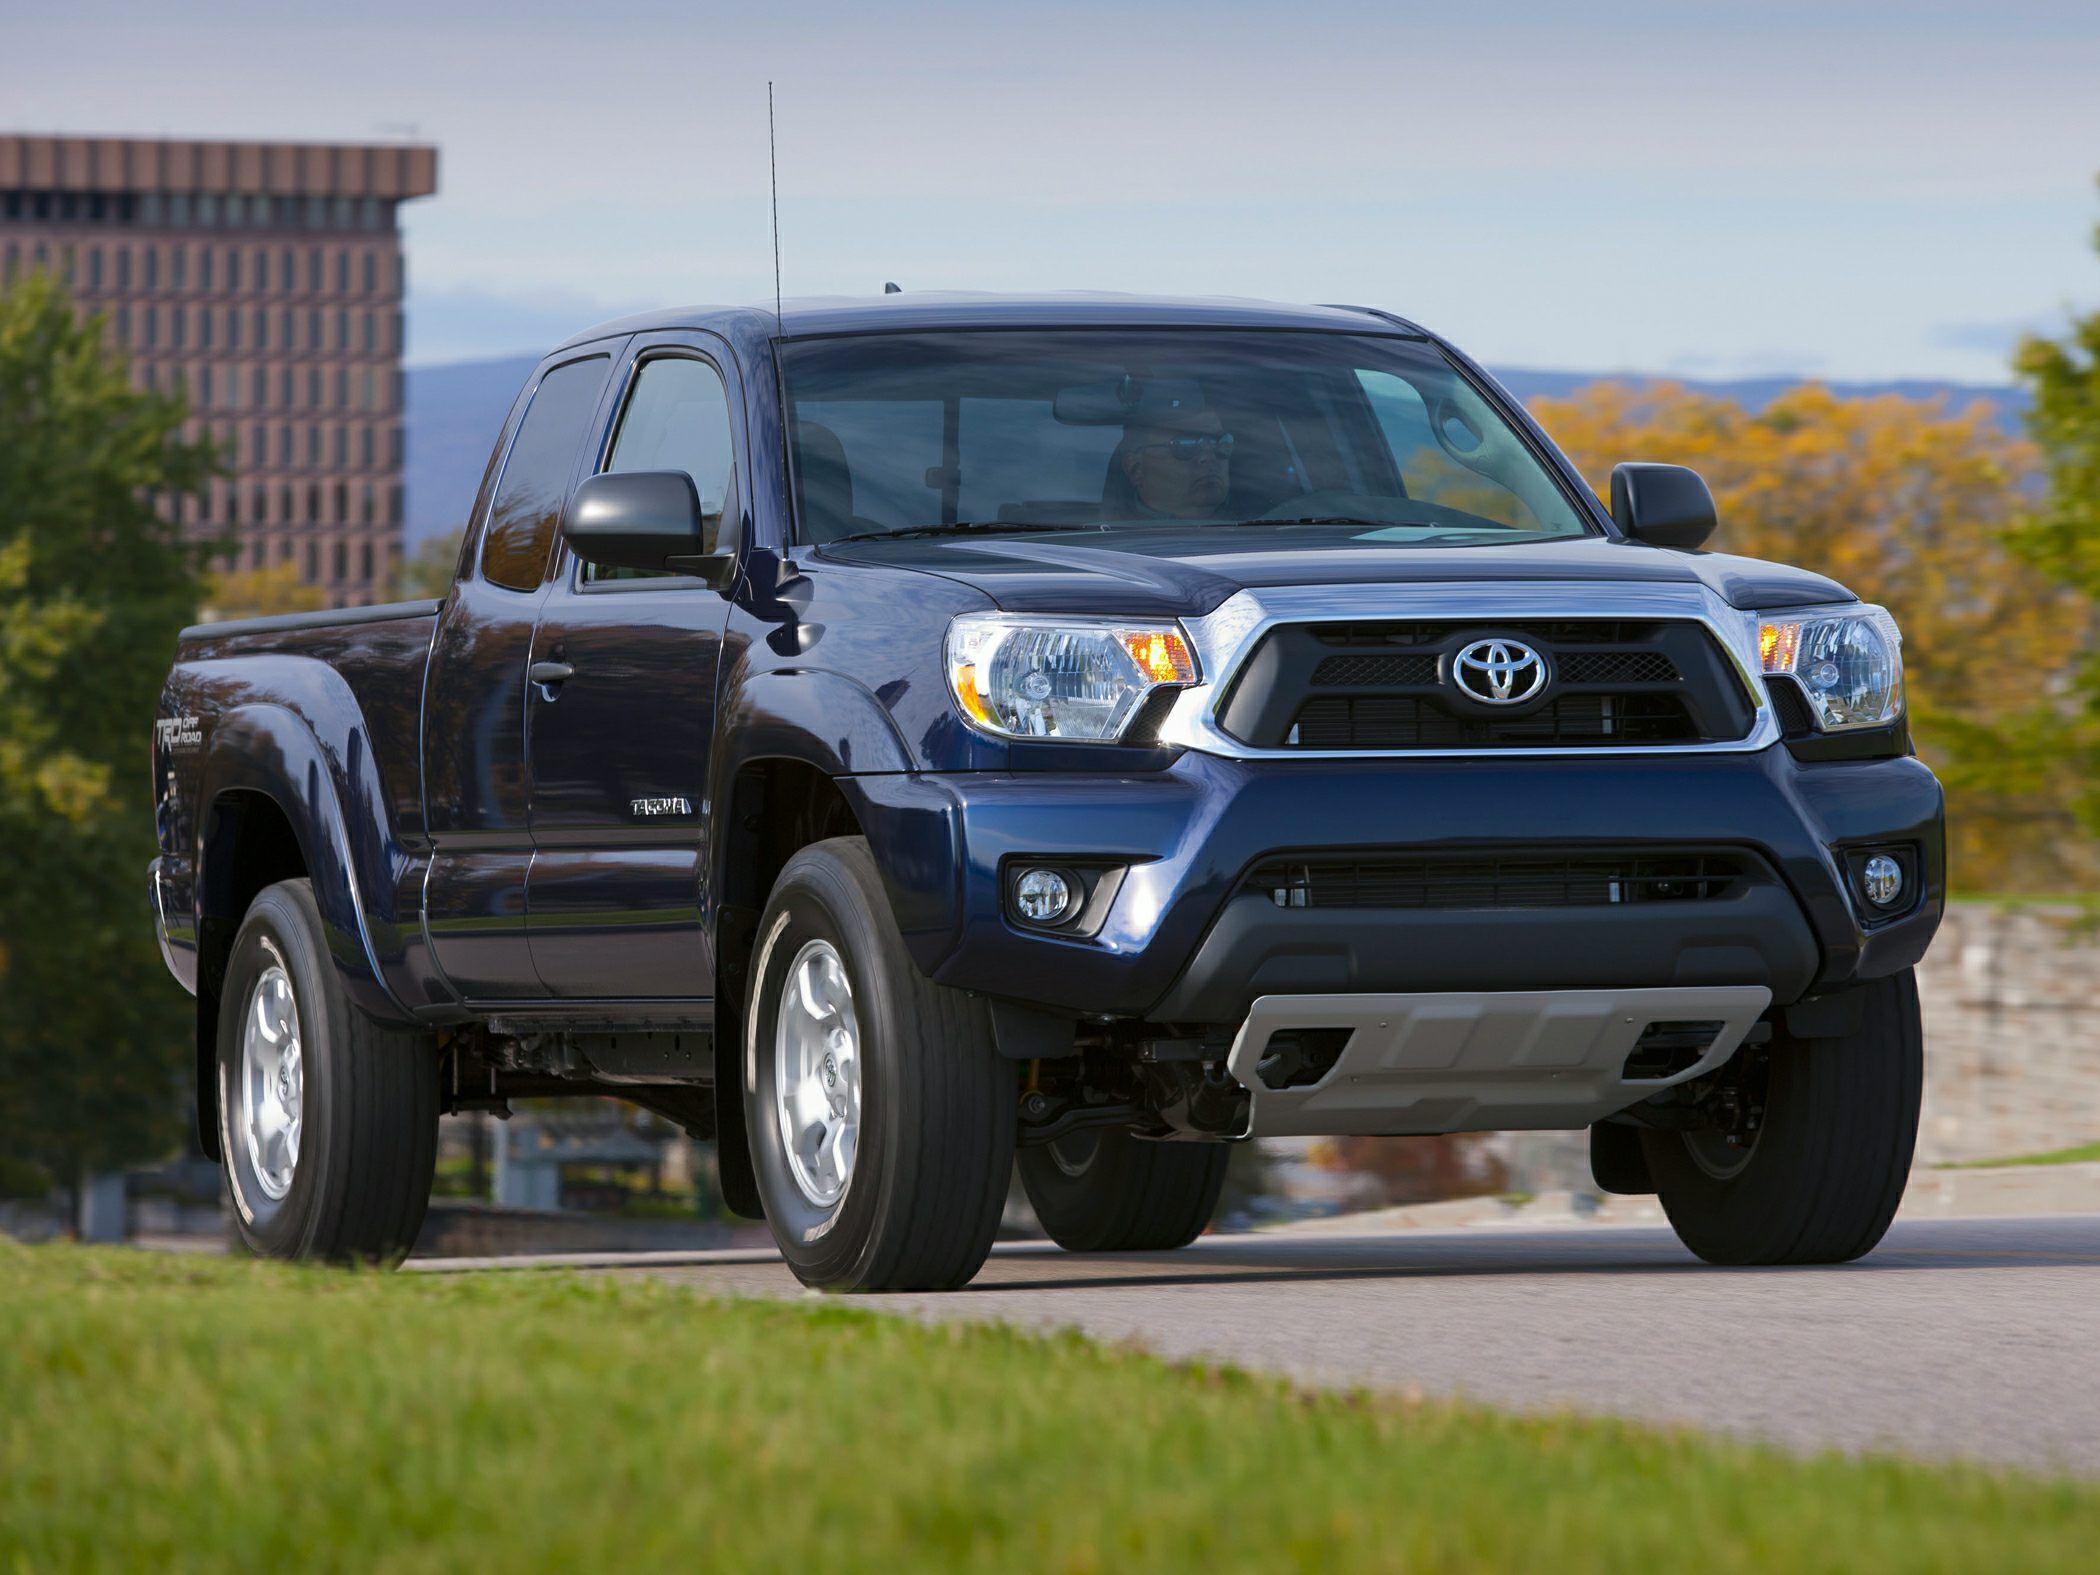 2015 Toyota Tacoma TRD Wallpapers  httpwallsautocom2015